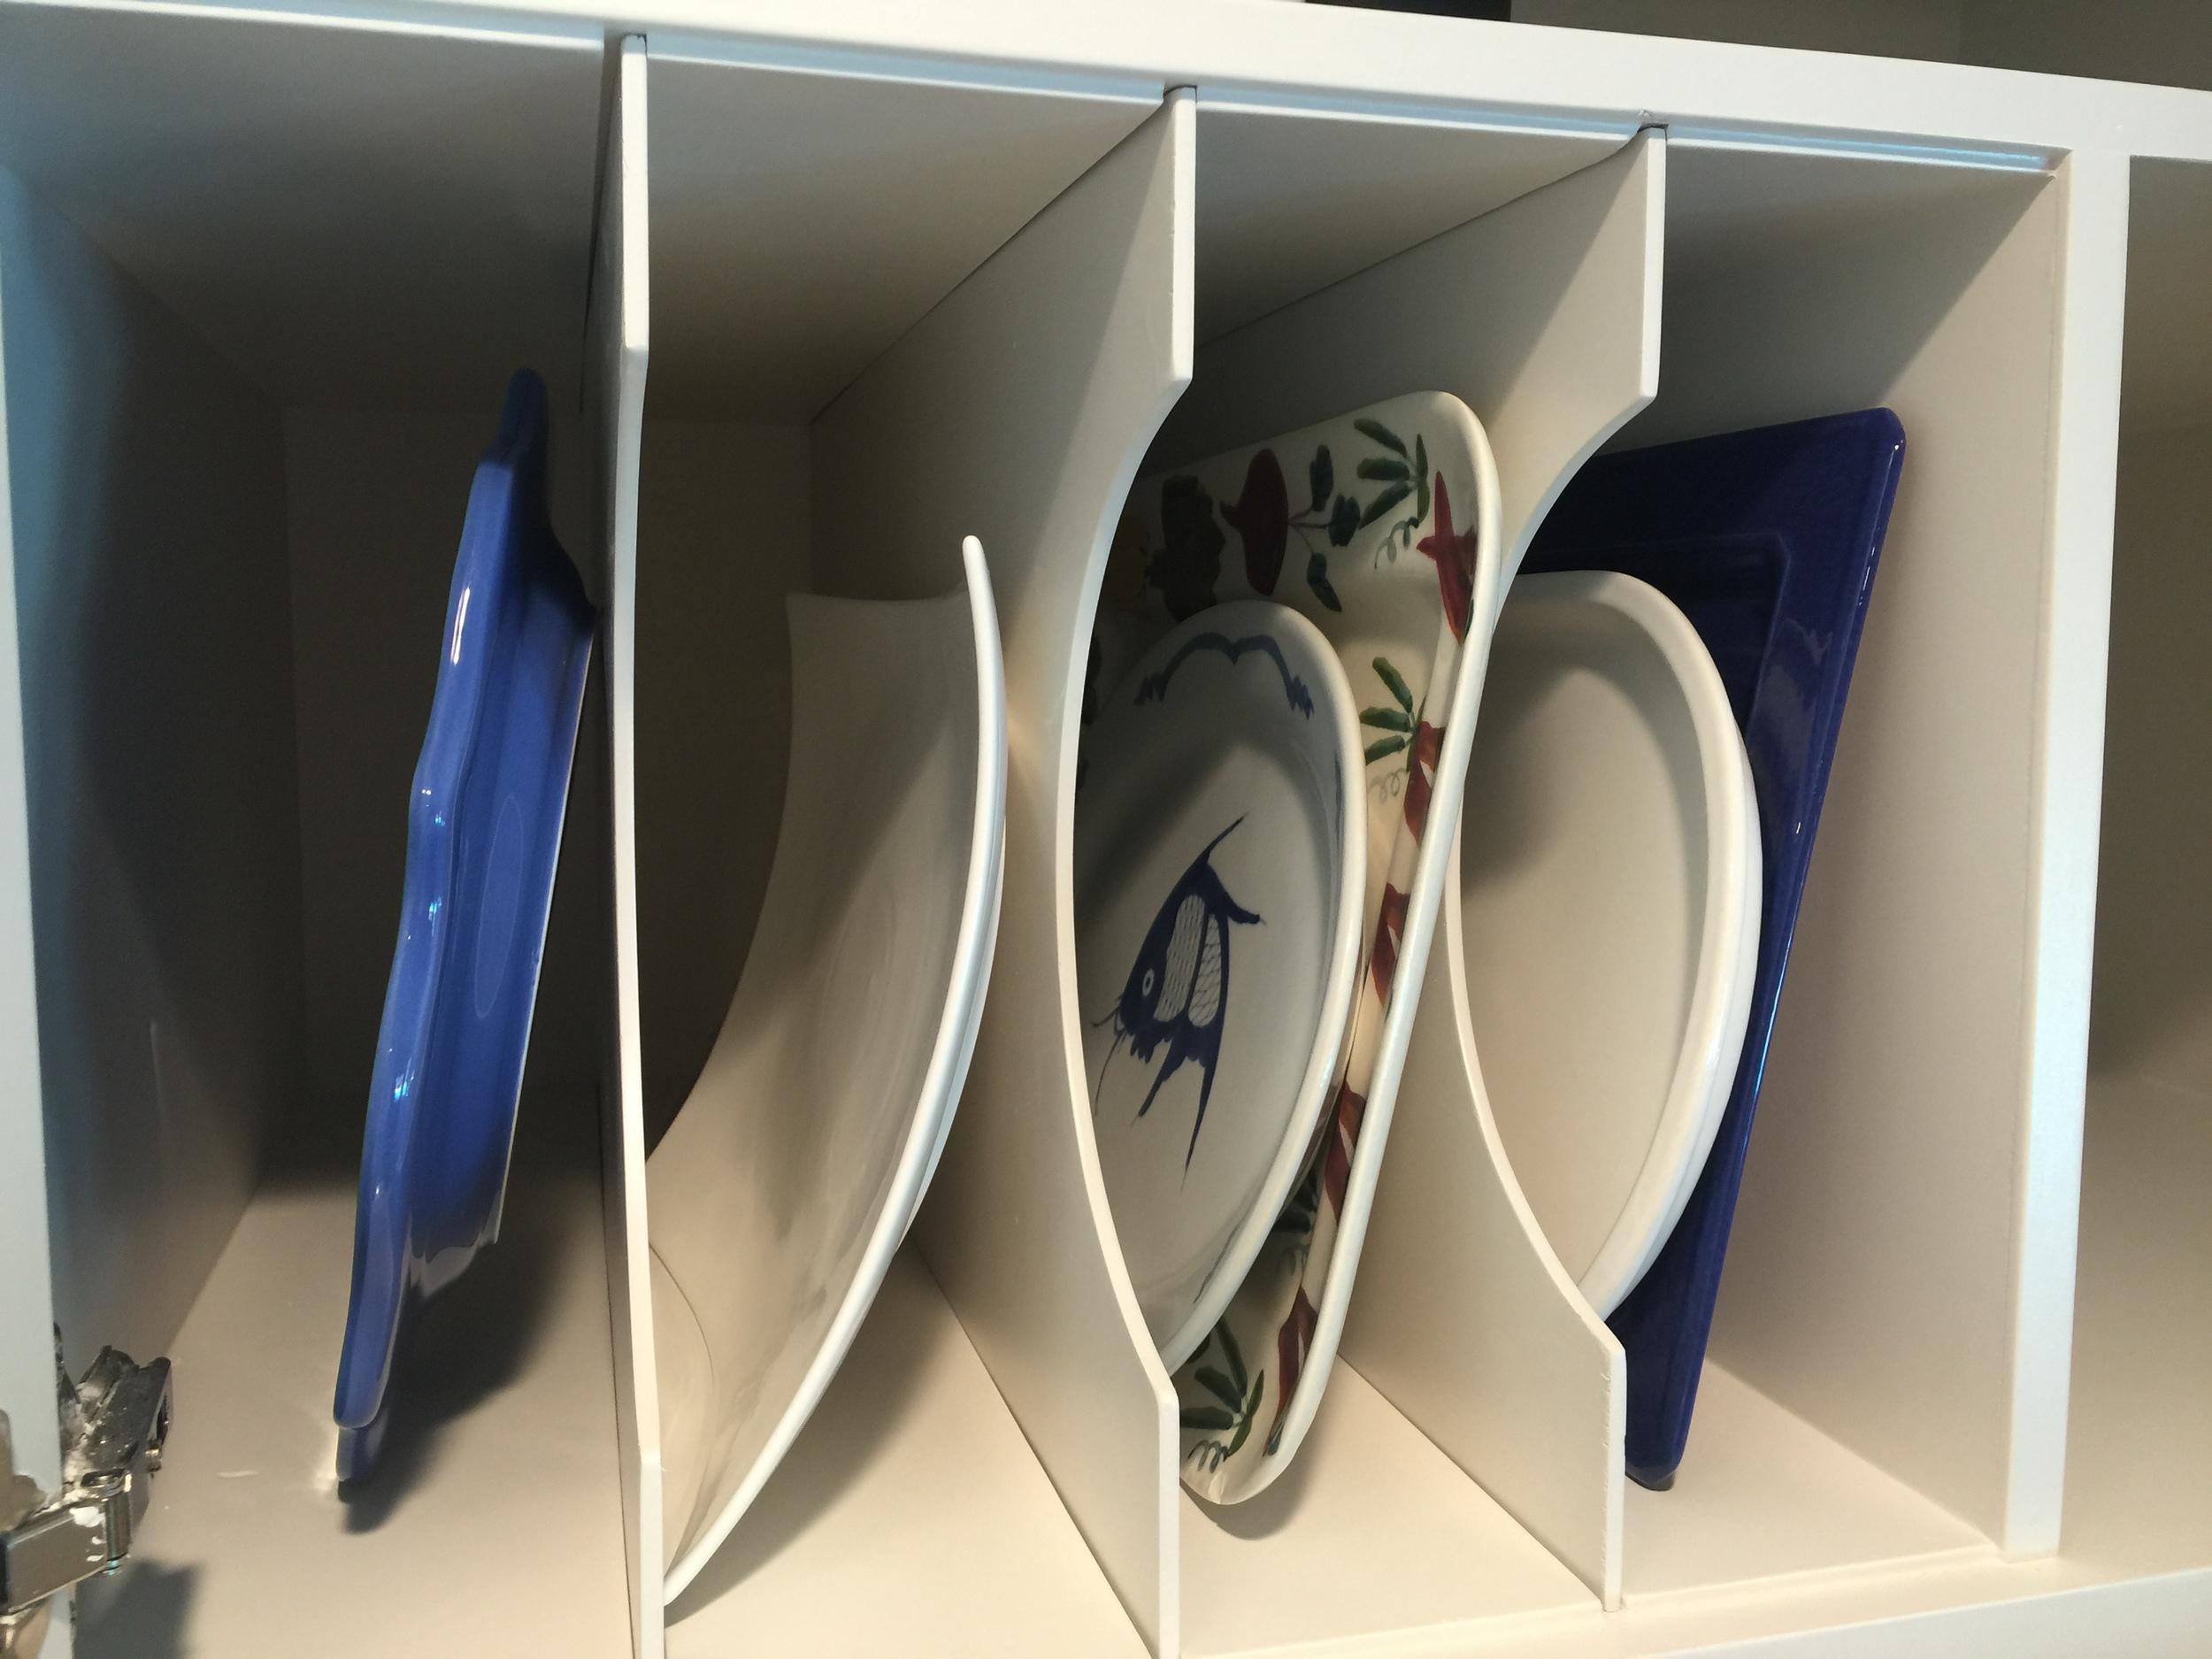 Vertical Divided Storage | Interior Designer: Carla Aston